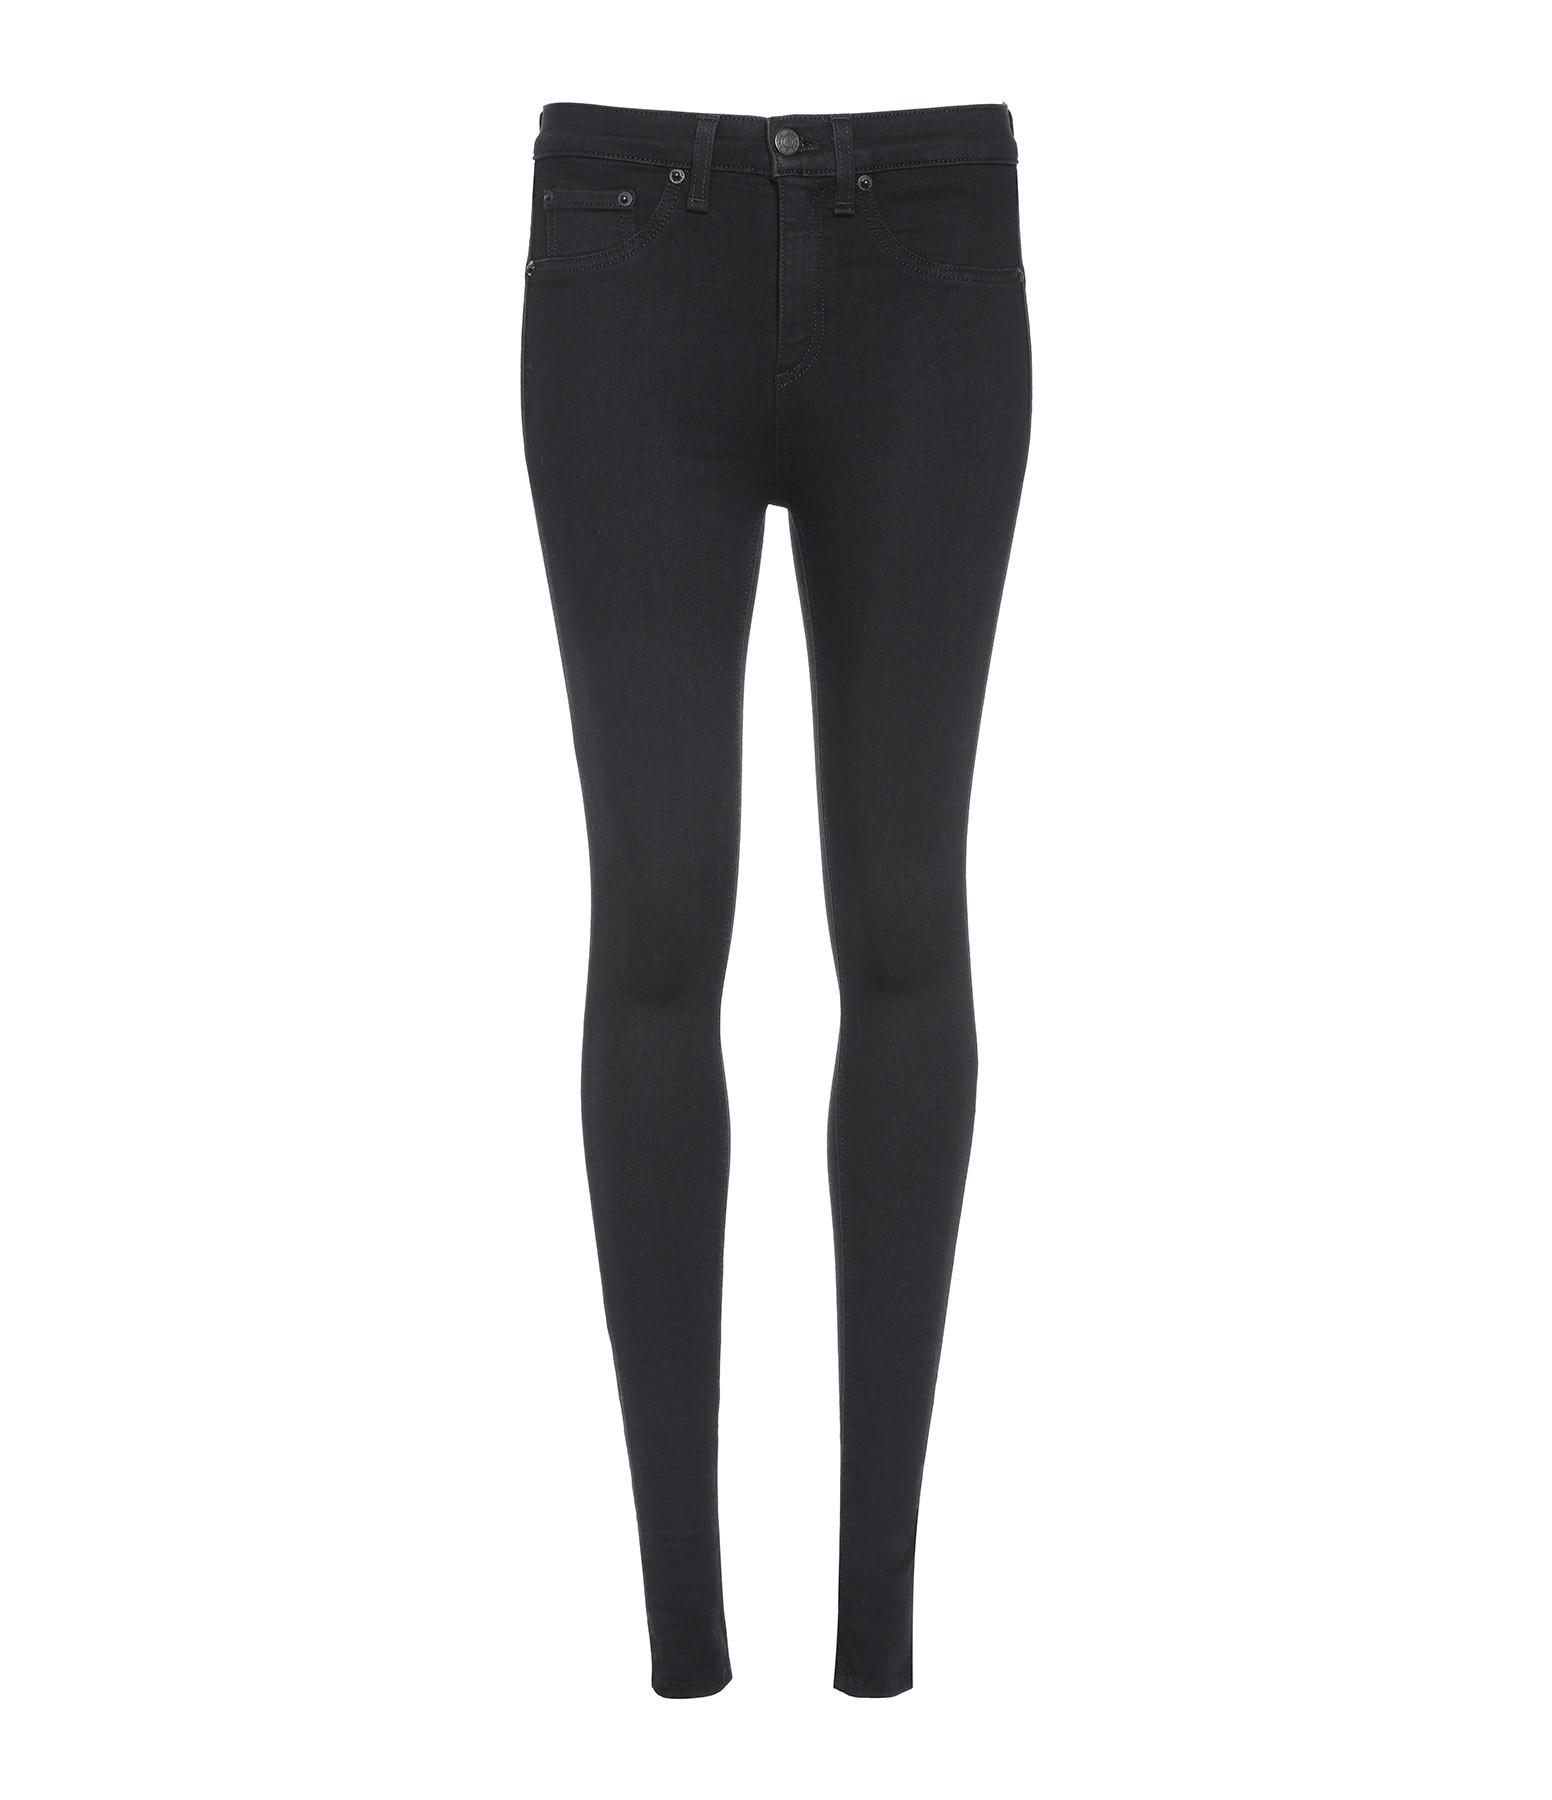 RAG & BONE - Jean High Rise Skinny Noir